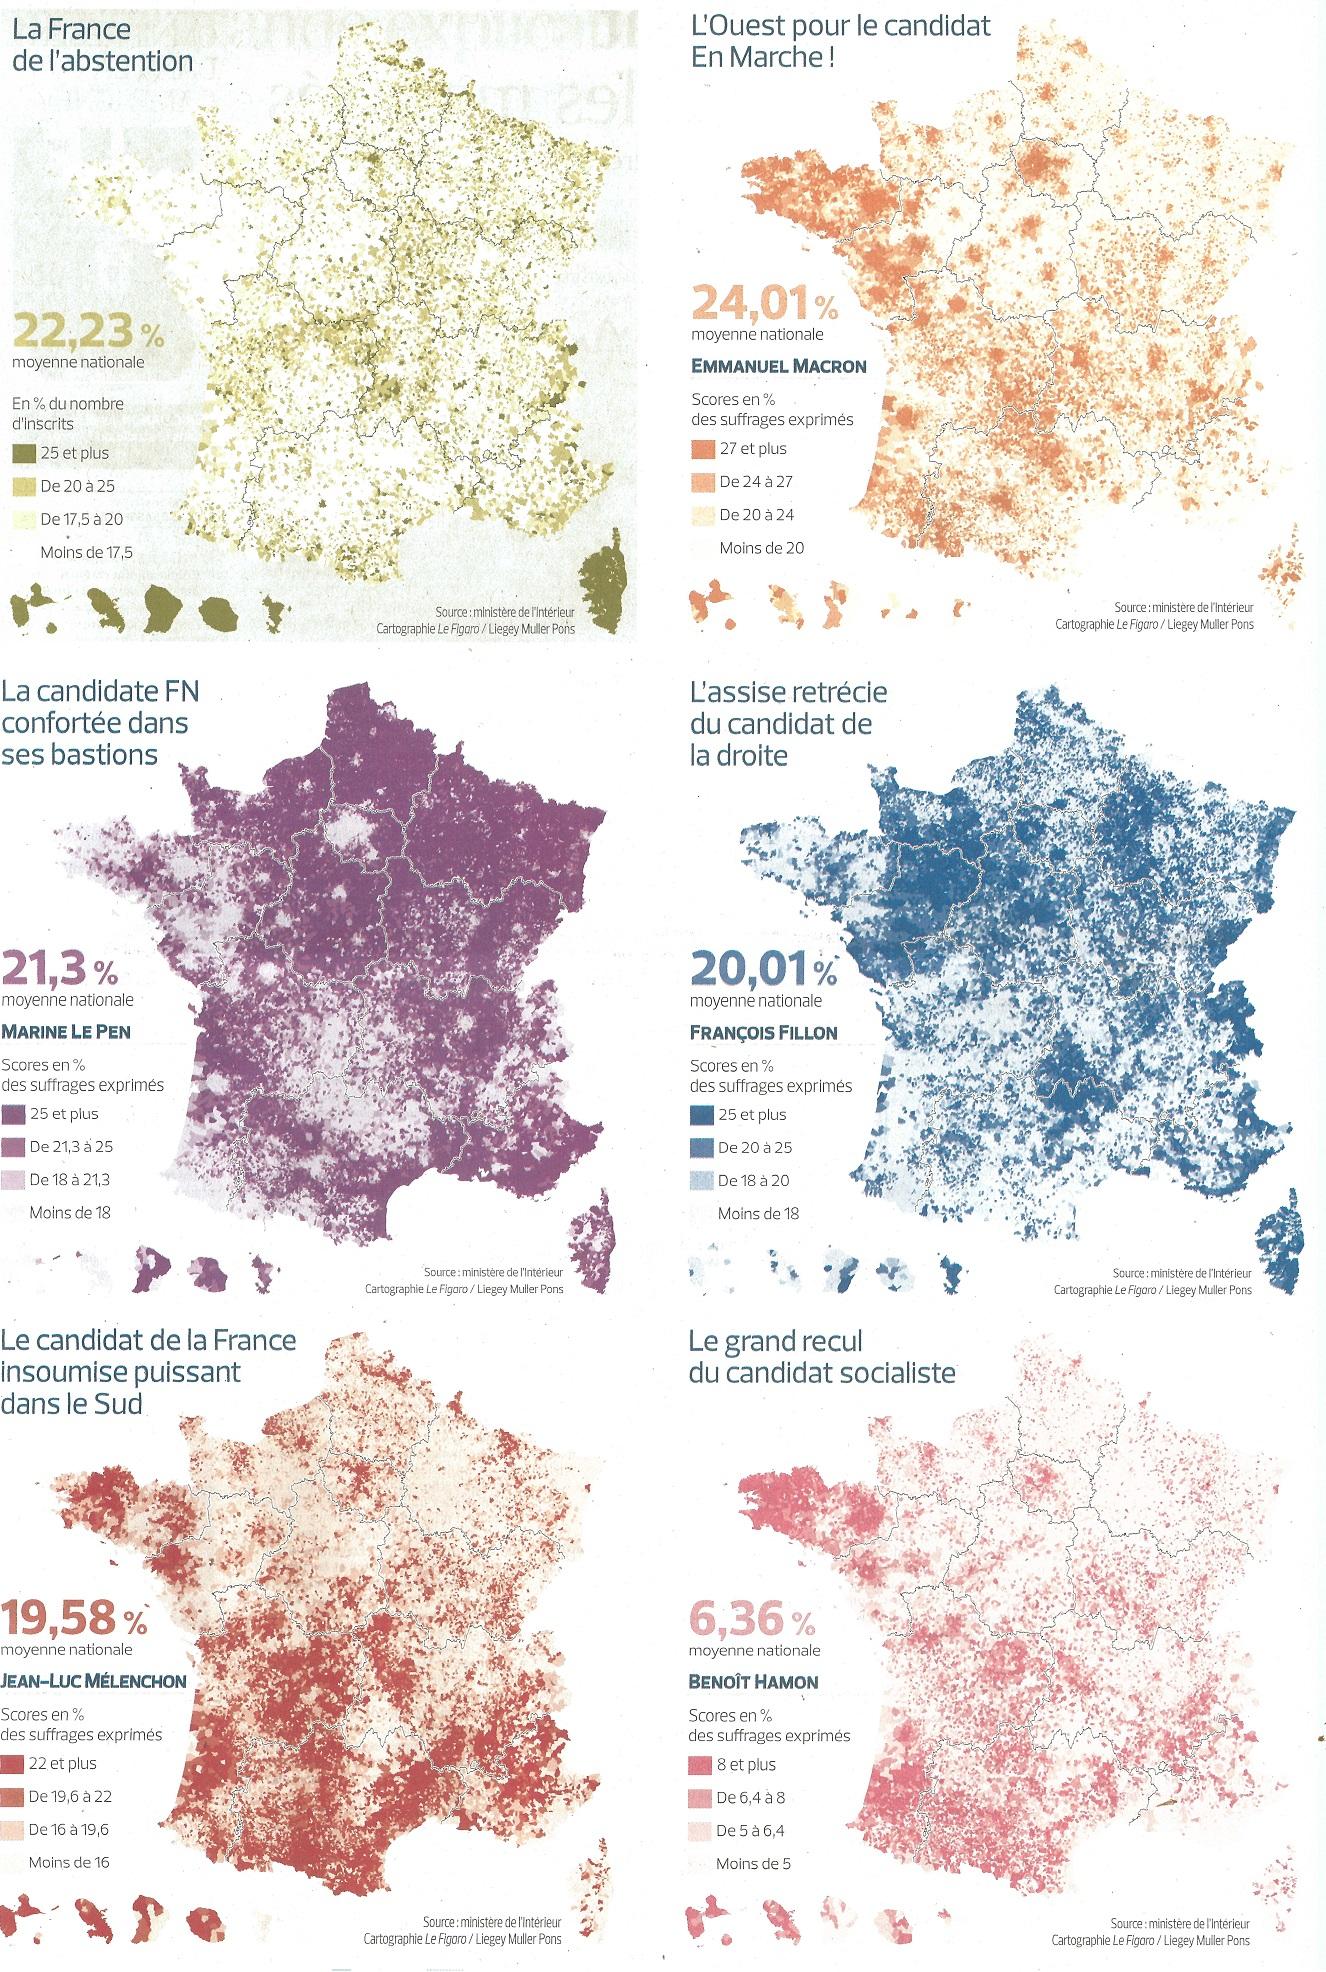 Source:  Le Figaro , 25 avril 2017